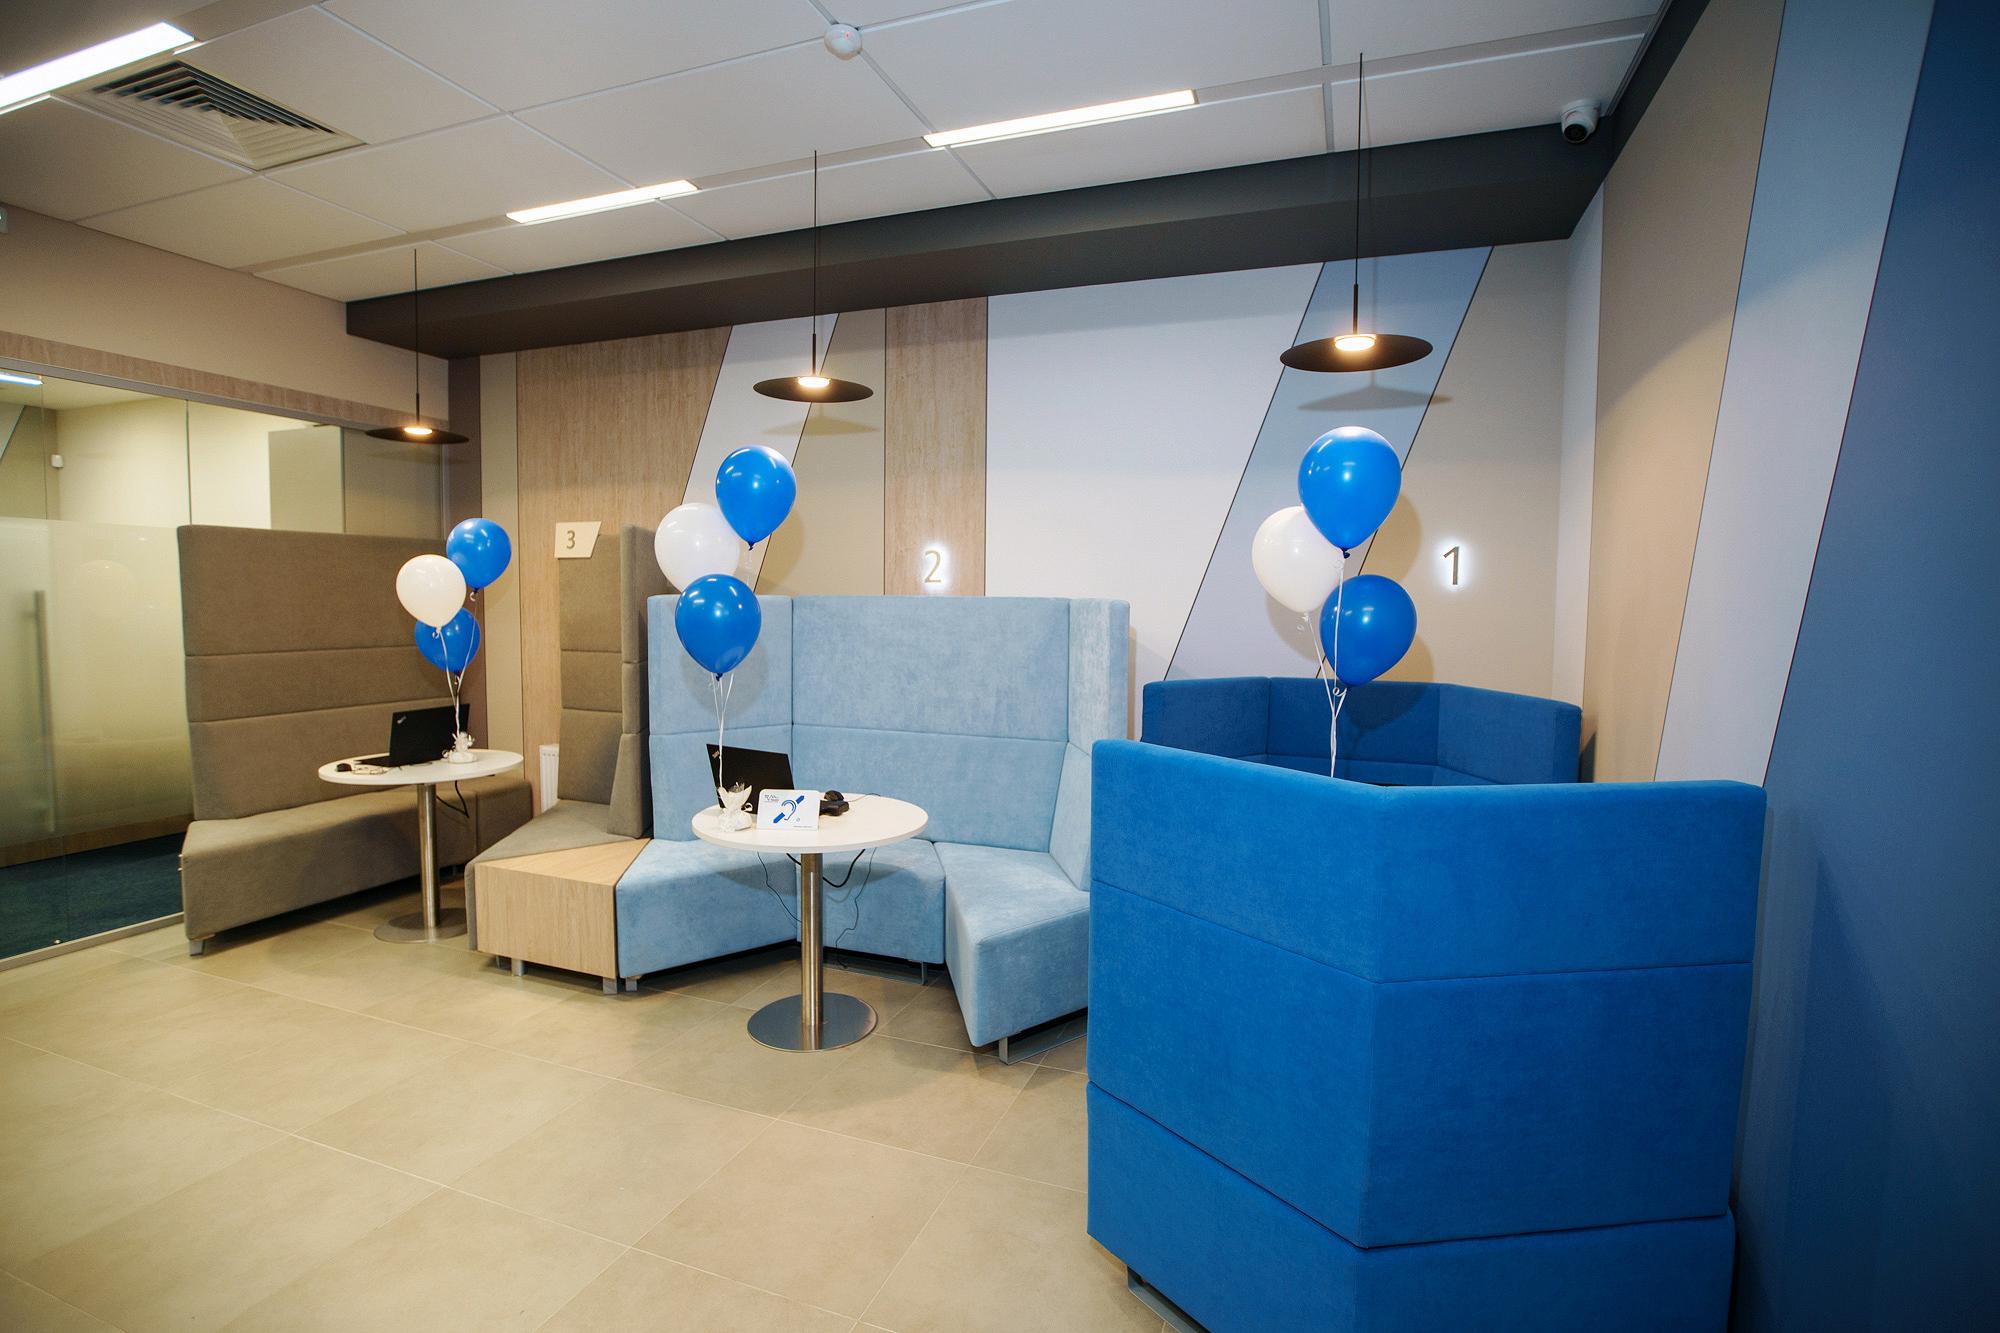 img 016 ВТБ открыл офис нового формата в Астрахани